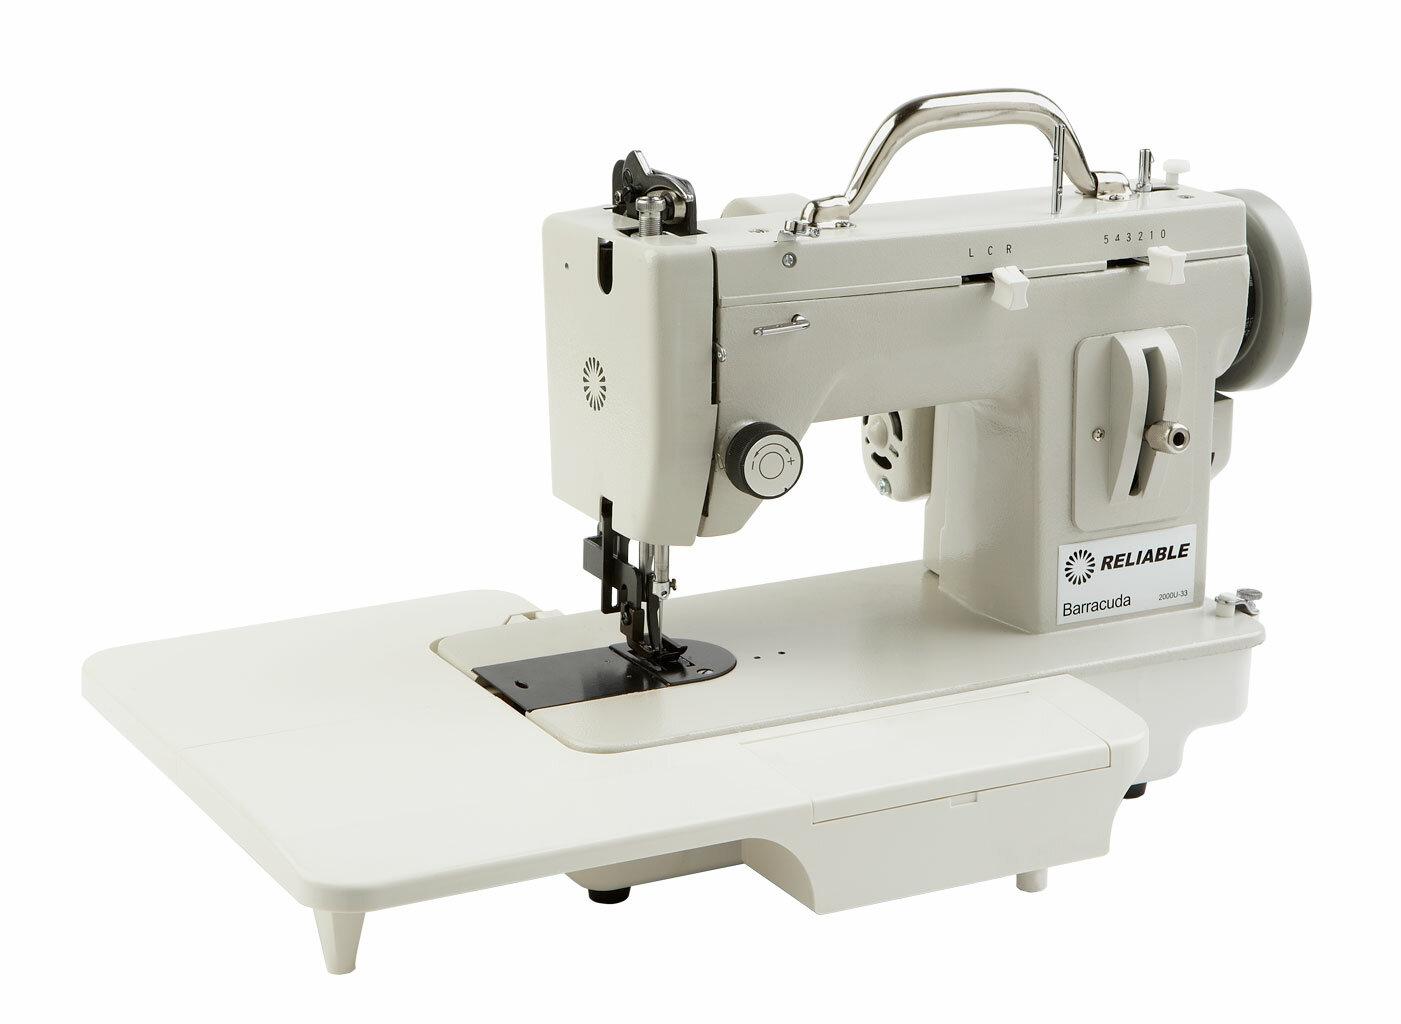 zig zag stitch on sewing machine